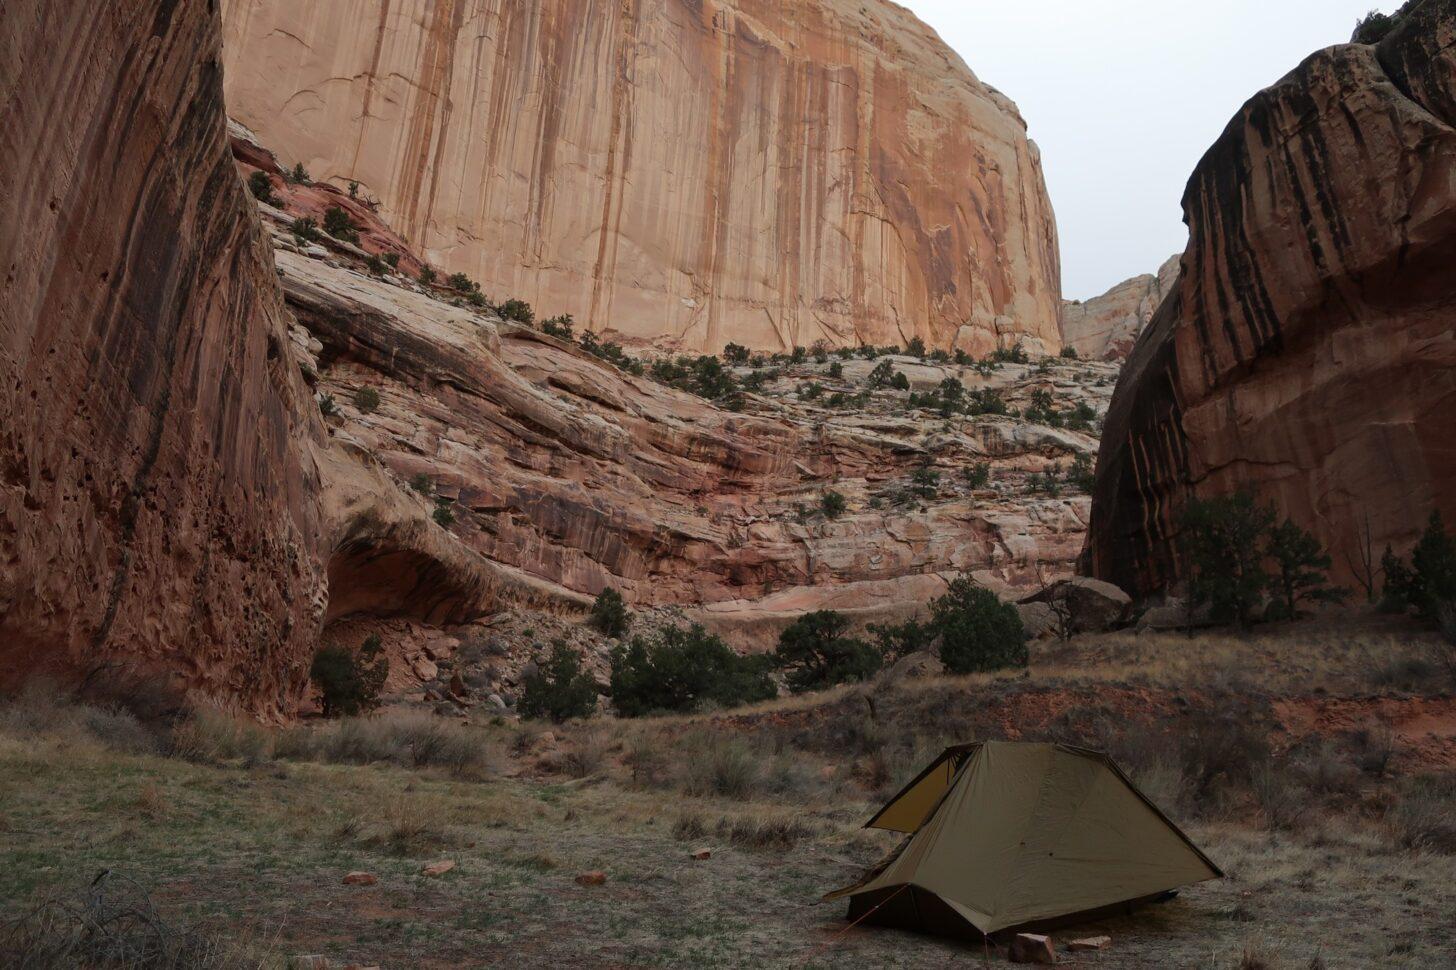 a small tent huddles beneath the sharply rising walls of a steep canyon.